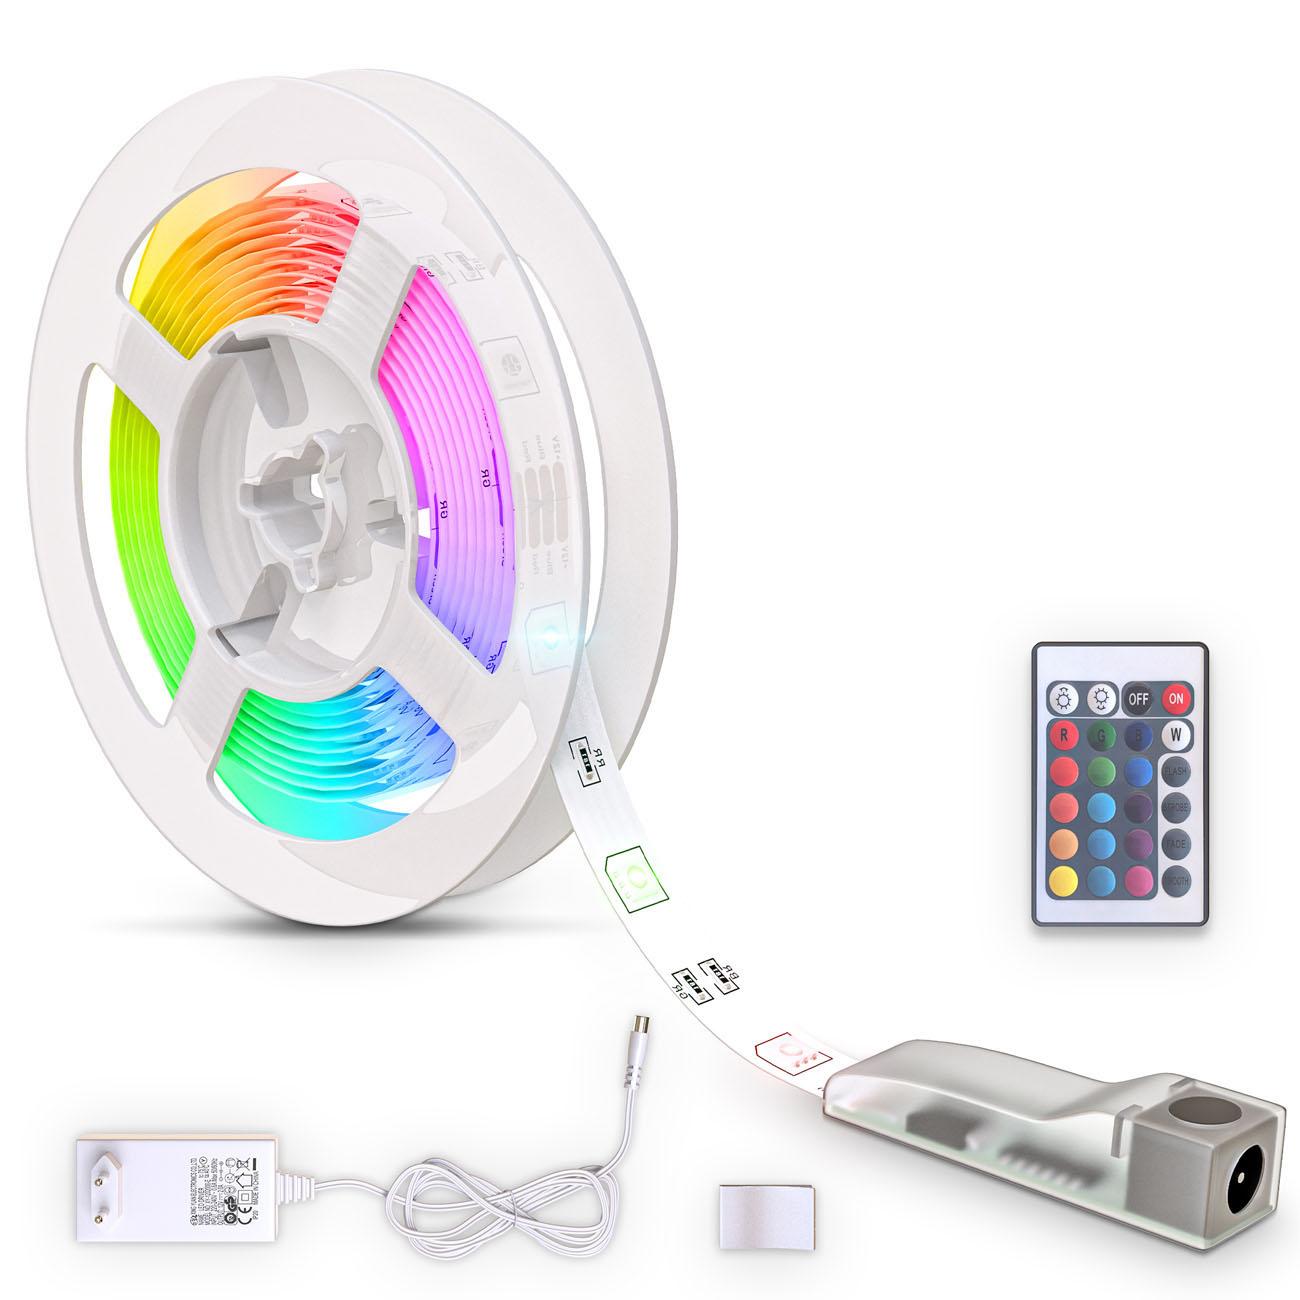 RGB LED Streifen mit Farbwechsel 3m - 1